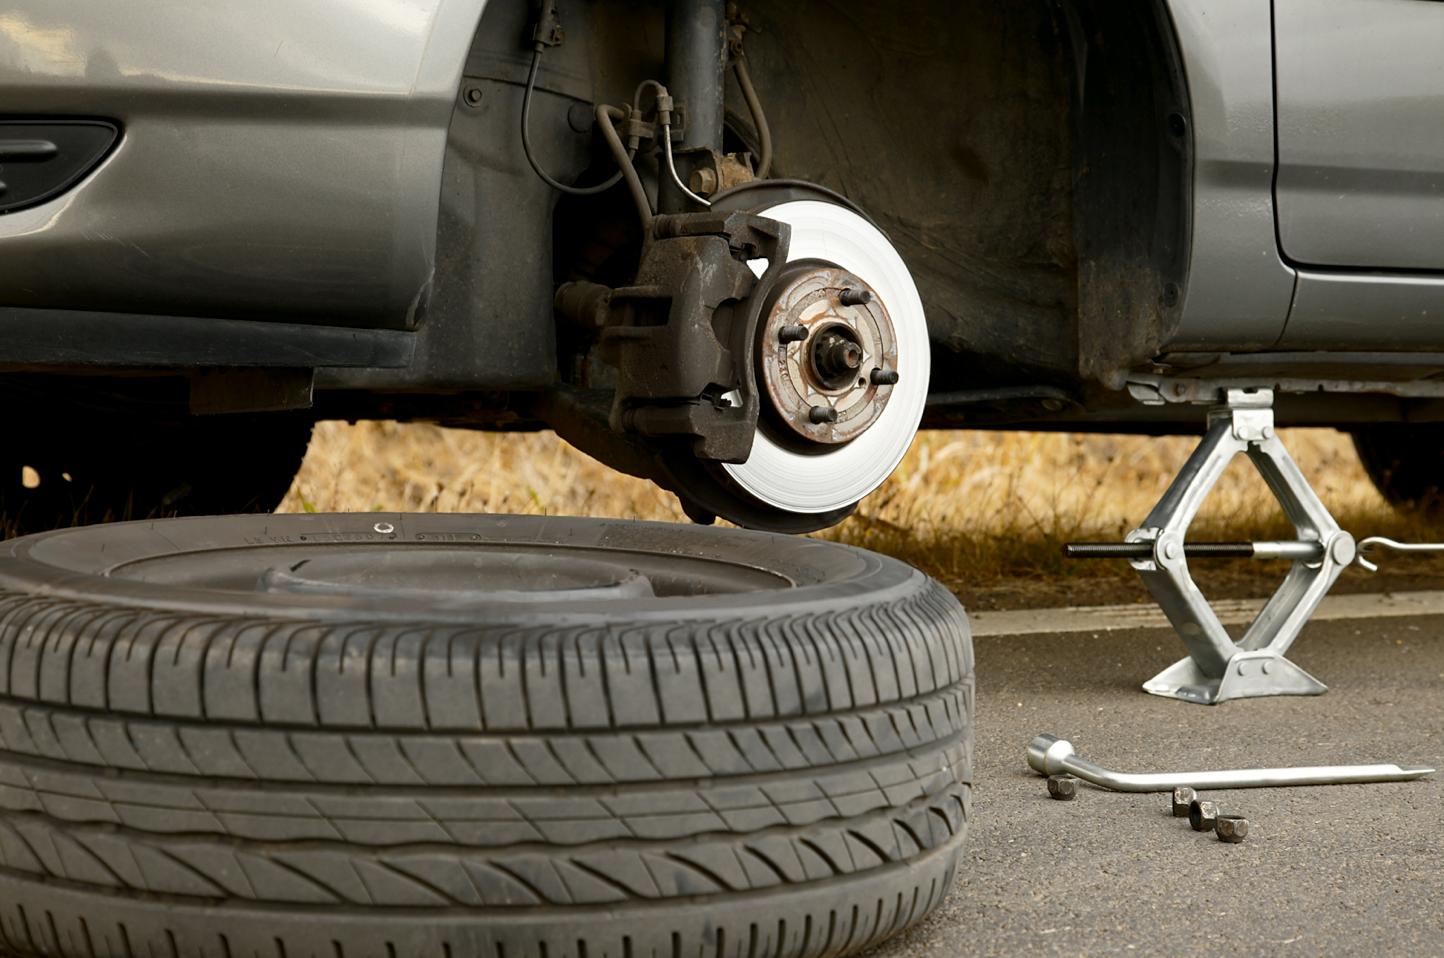 Change car tire